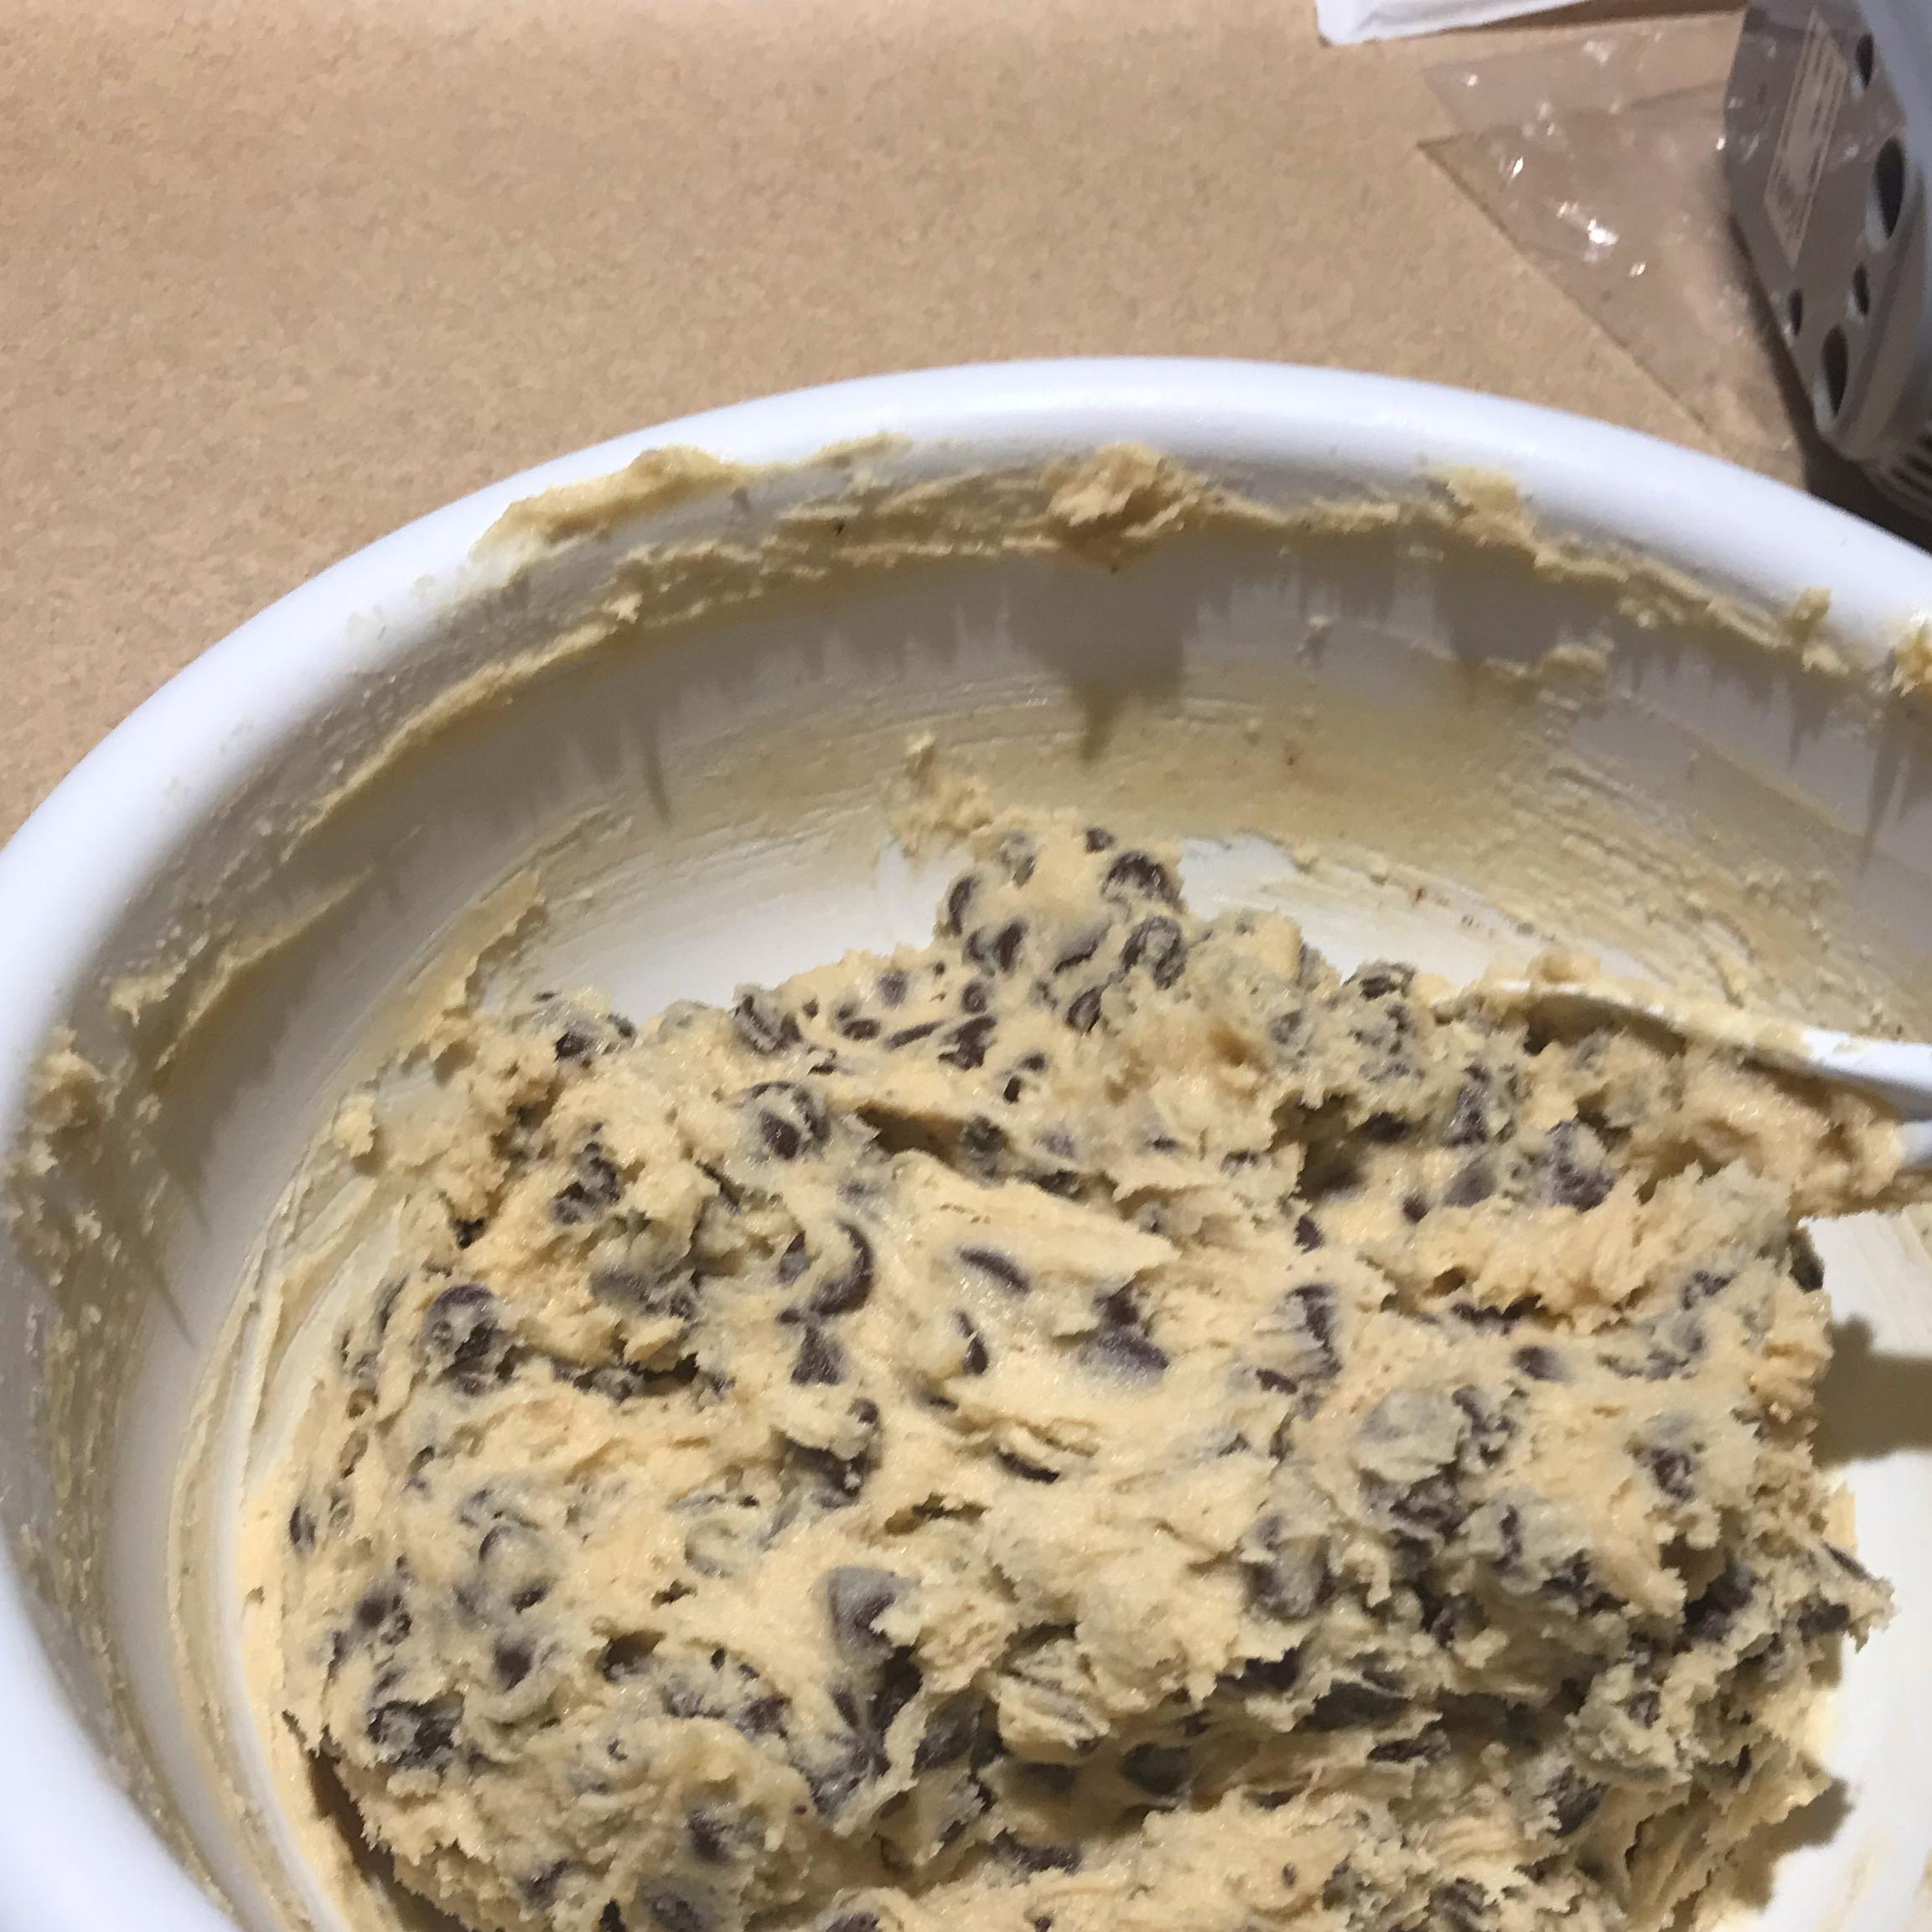 Original Nestle® Toll House Chocolate Chip Cookies